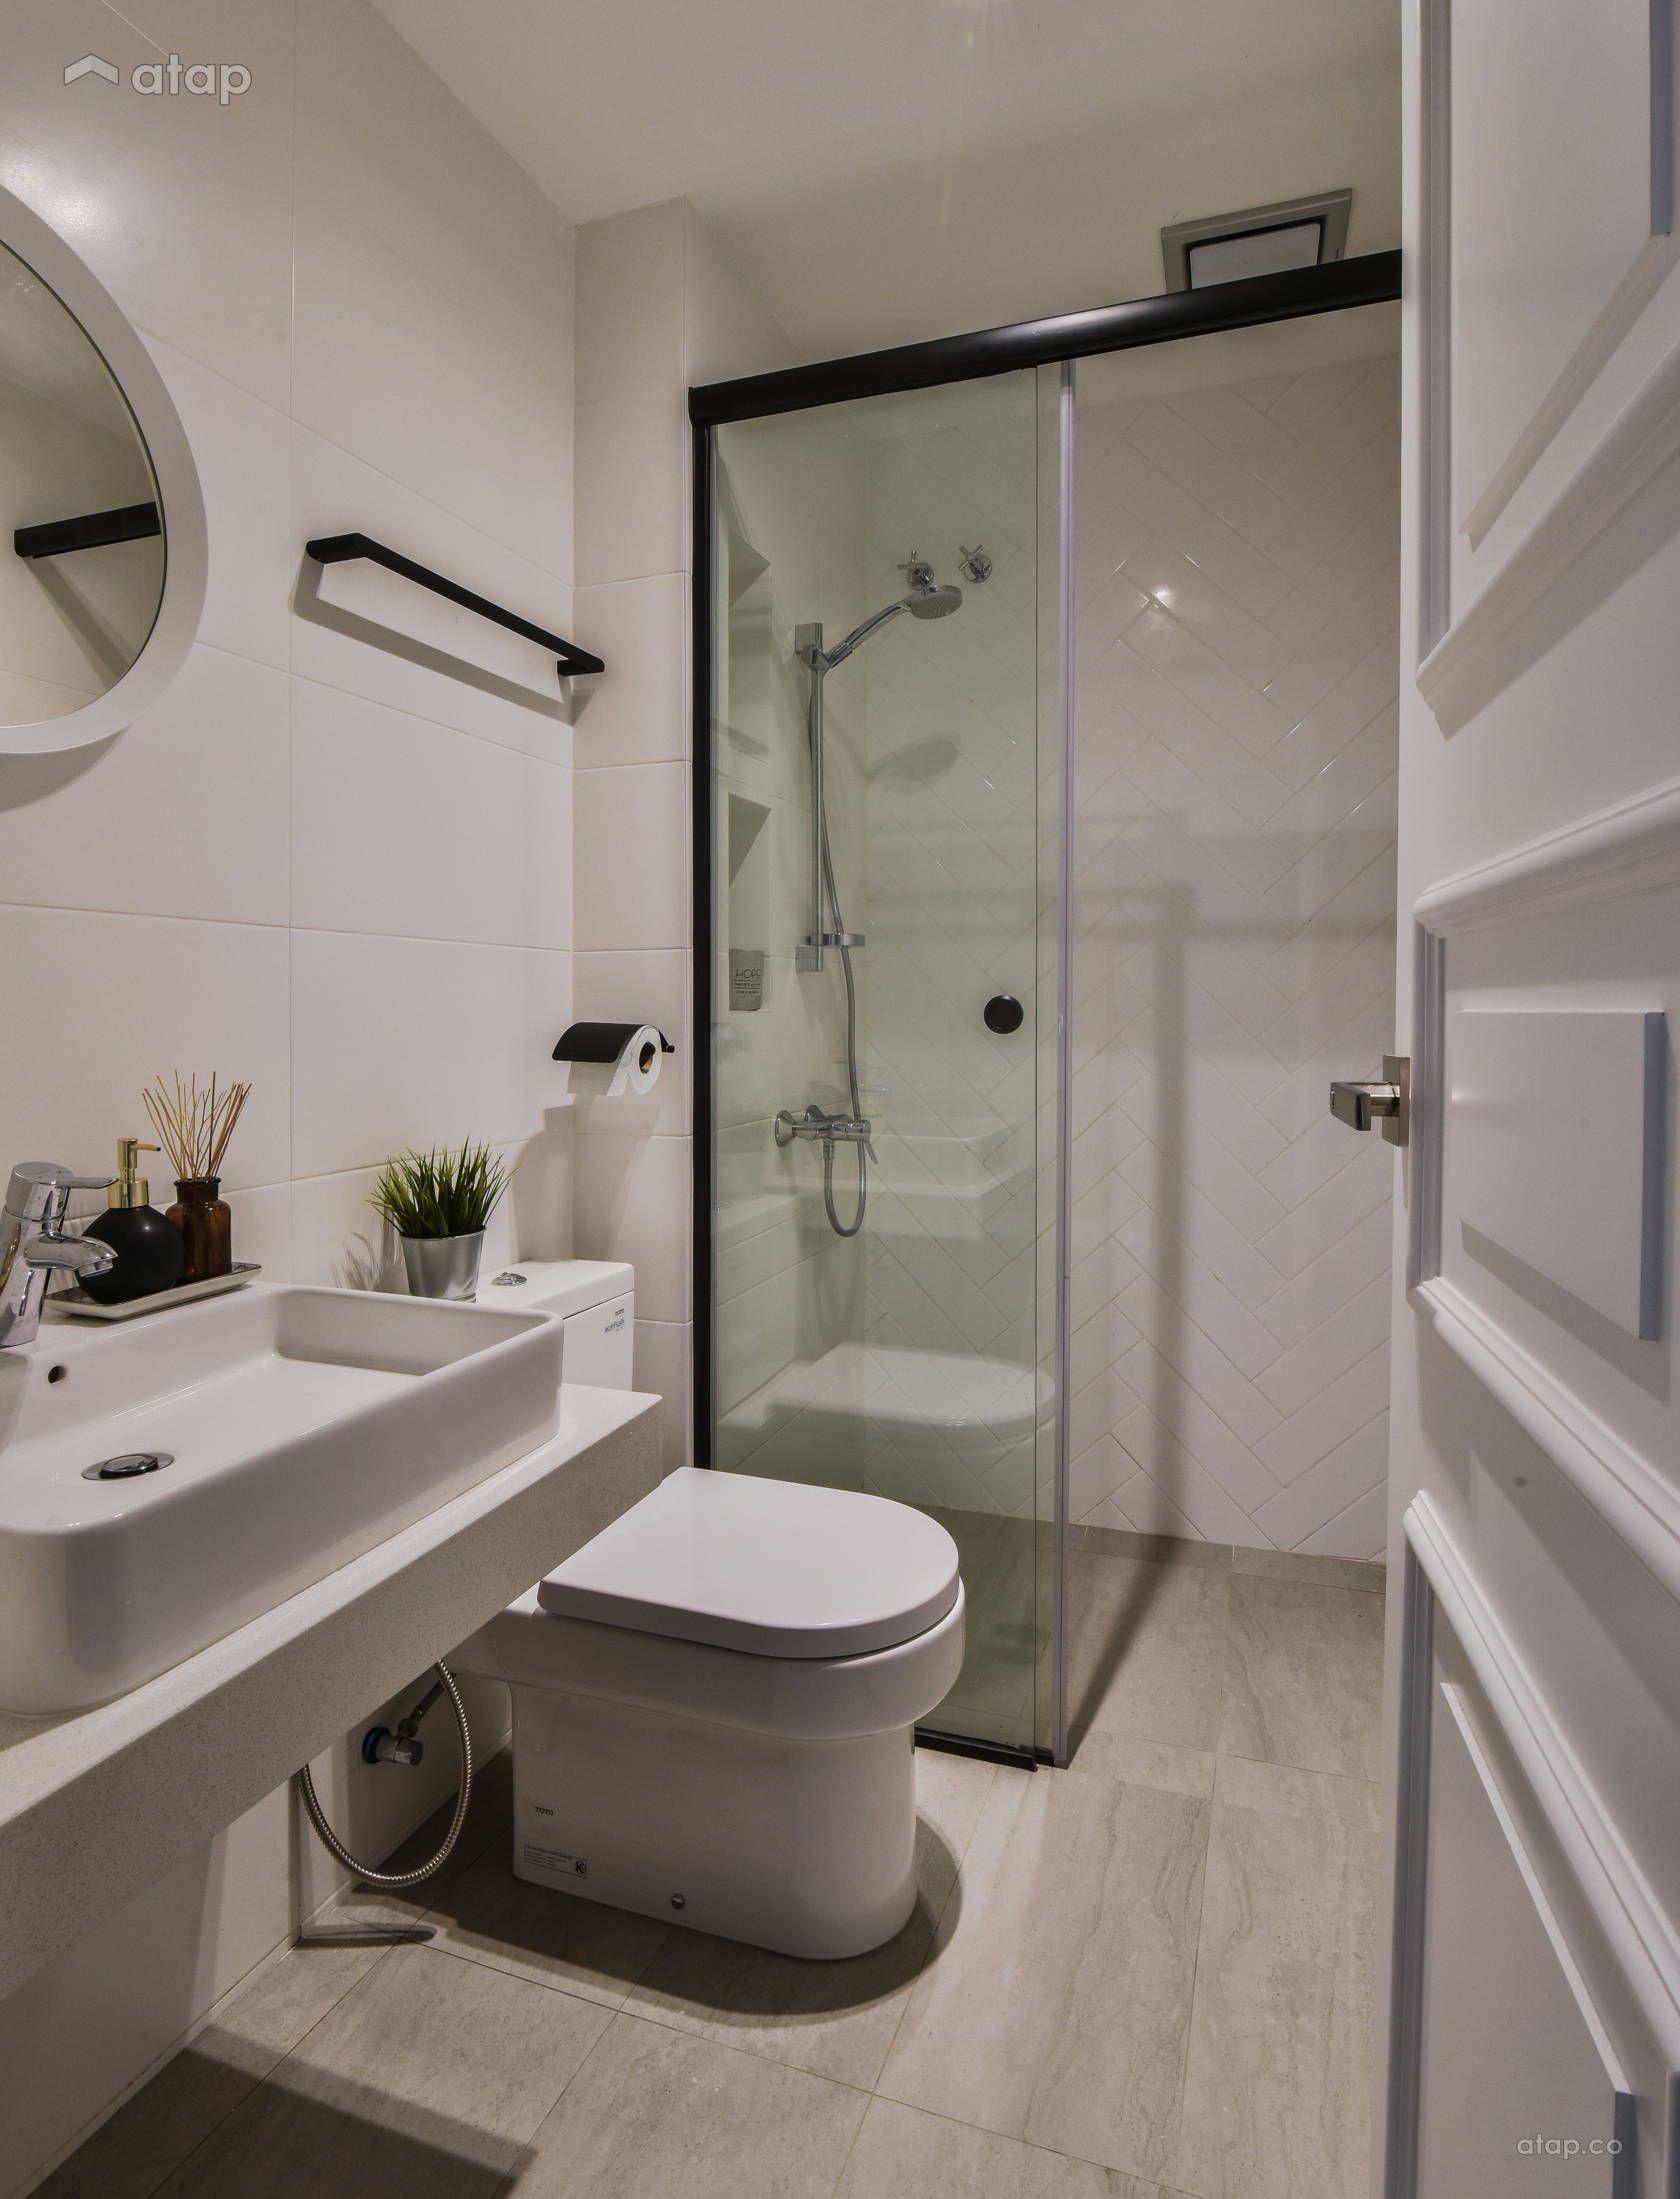 Minimalistic Scandinavian Bathroom Terrace Design Ideas Photos Malaysia Atap Co Bathroom Remodel Cost Small Bathroom Design Bathrooms Remodel